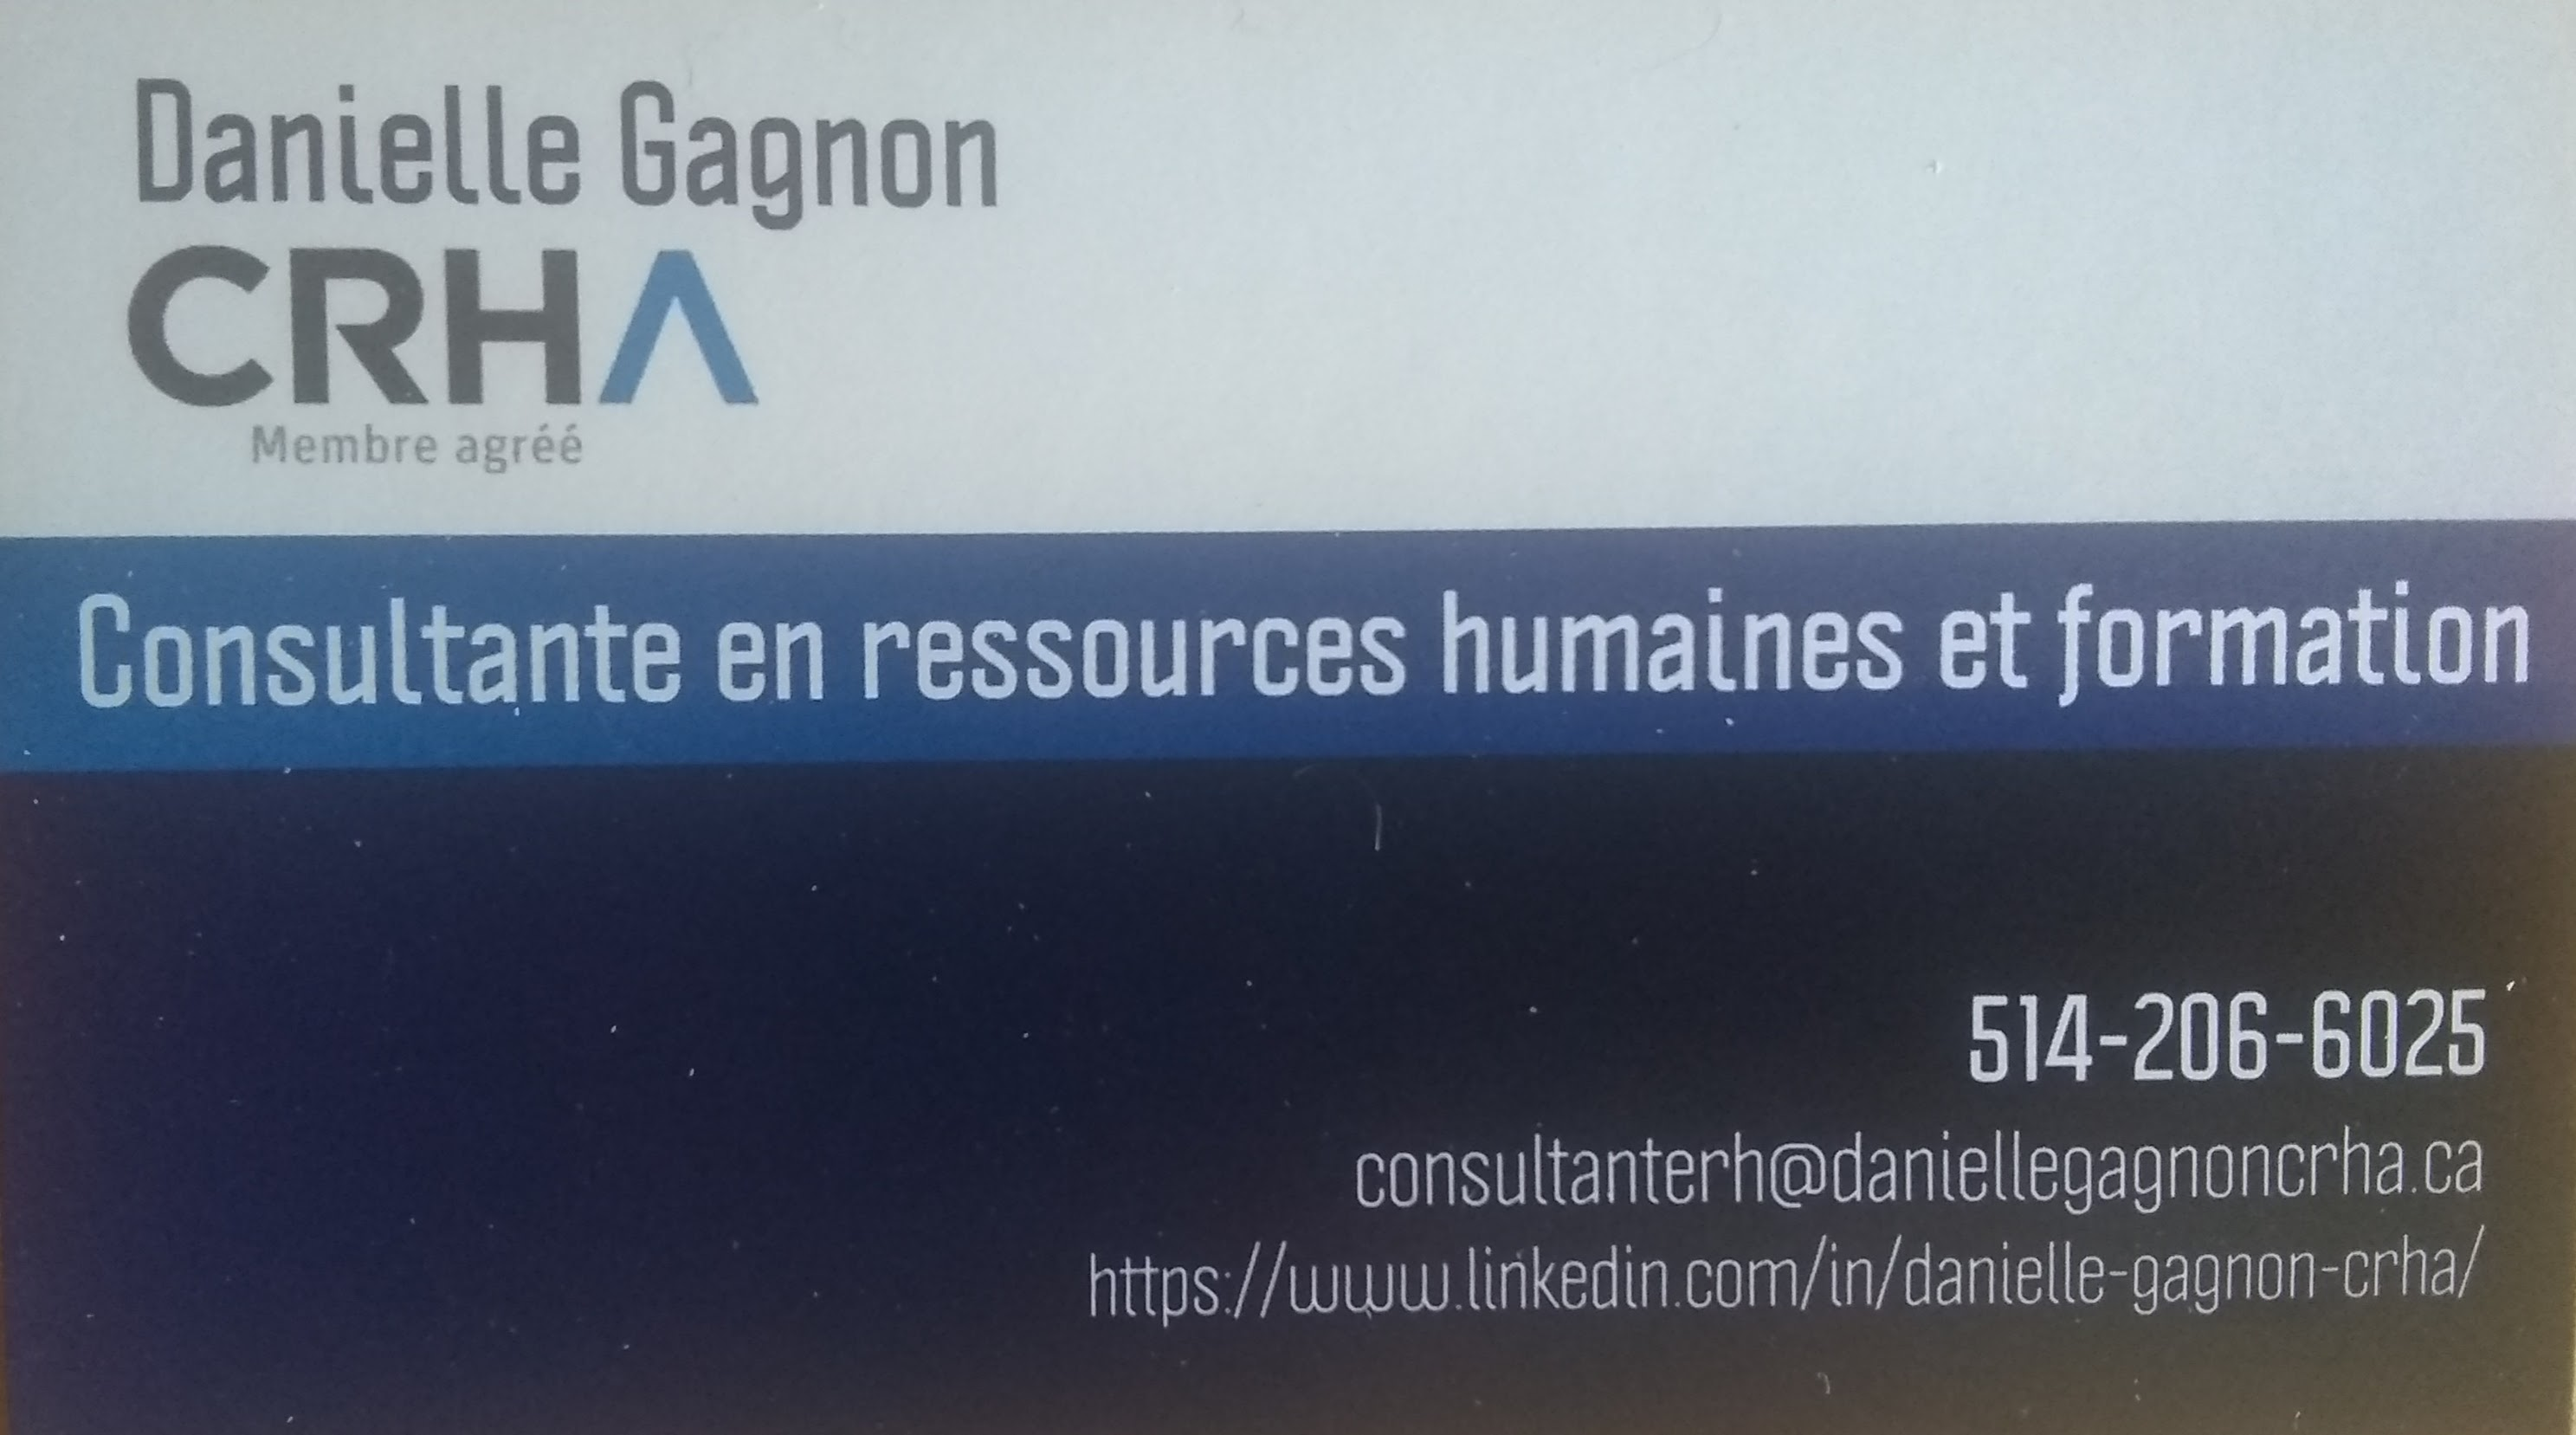 Logo Danielle Gagnon, CRHA, Consultante RH et formation